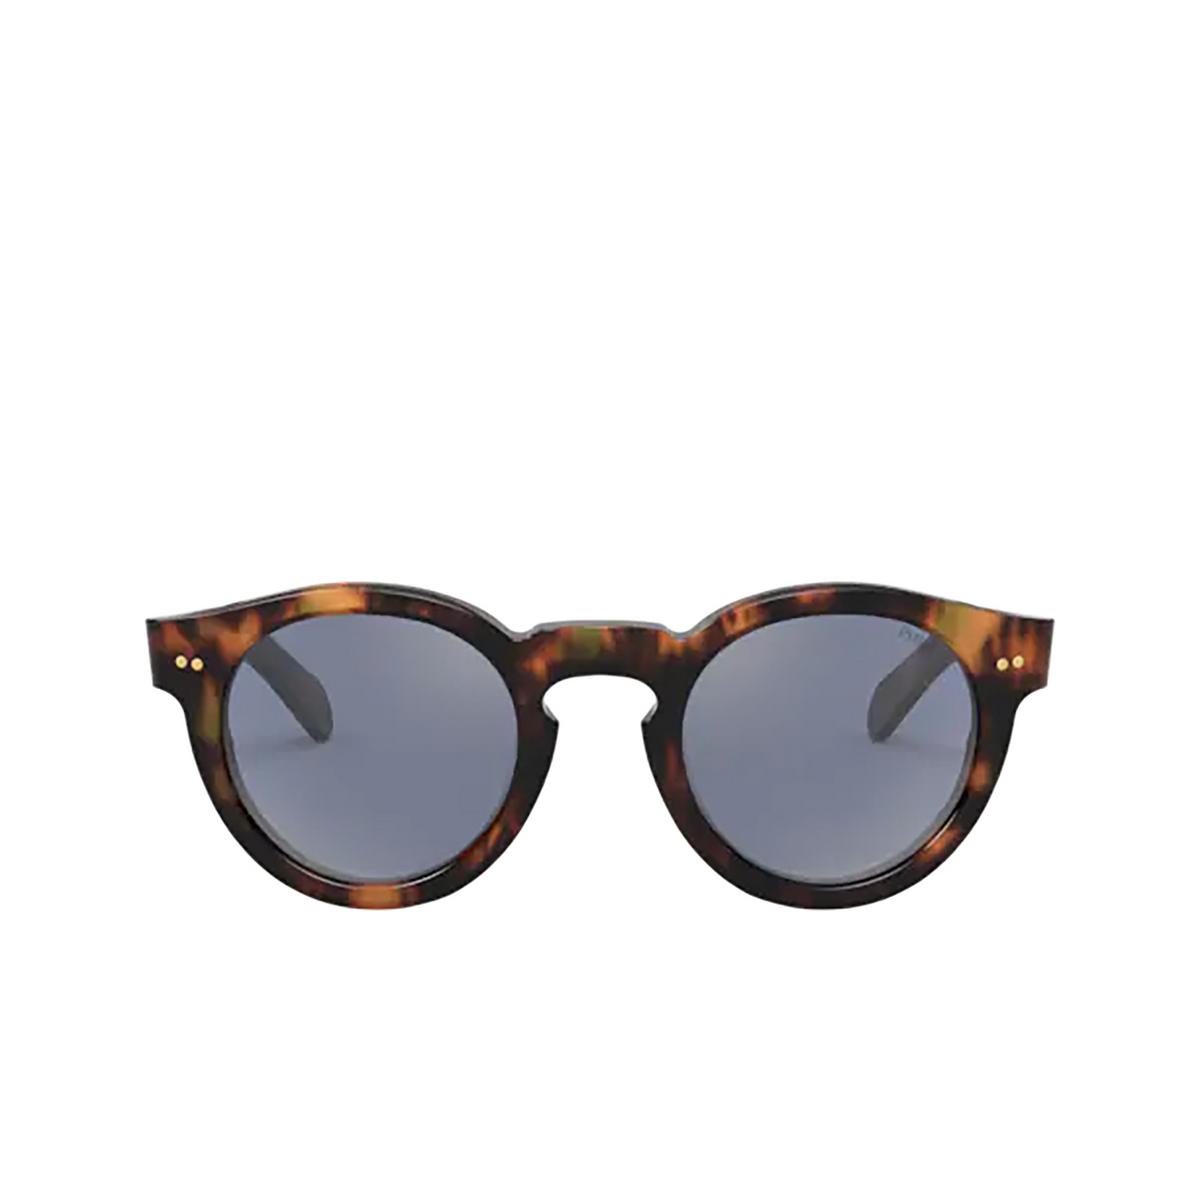 Polo Ralph Lauren® Round Sunglasses: PH4165 color Shiny Jerry Havana 50171U - front view.